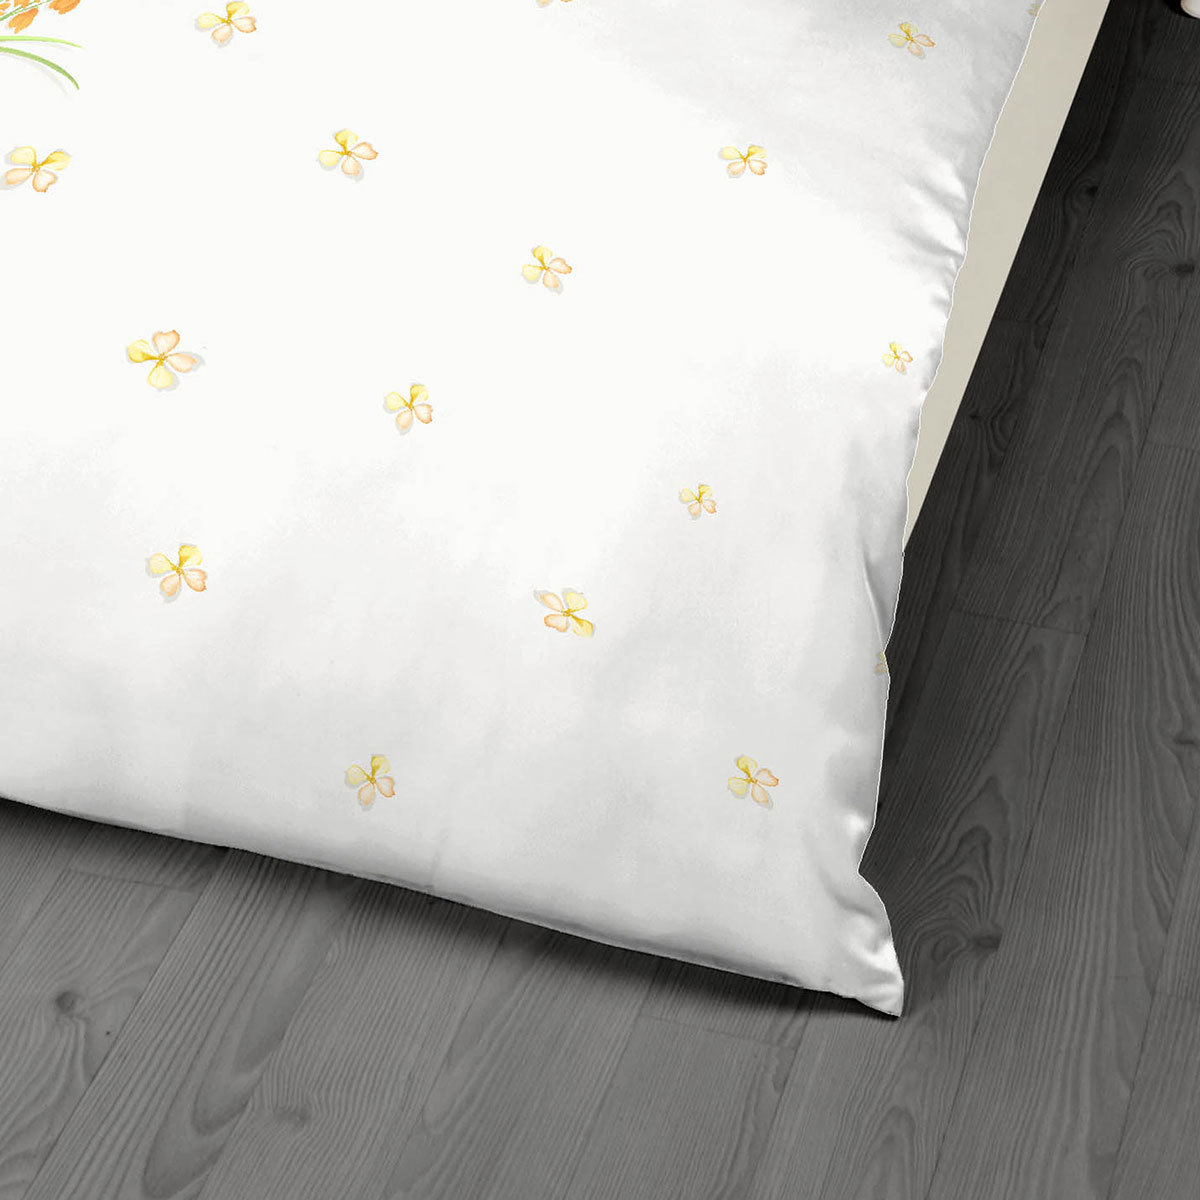 kaeppel seersucker bettw sche viola gelb g nstig online kaufen bei bettwaren shop. Black Bedroom Furniture Sets. Home Design Ideas